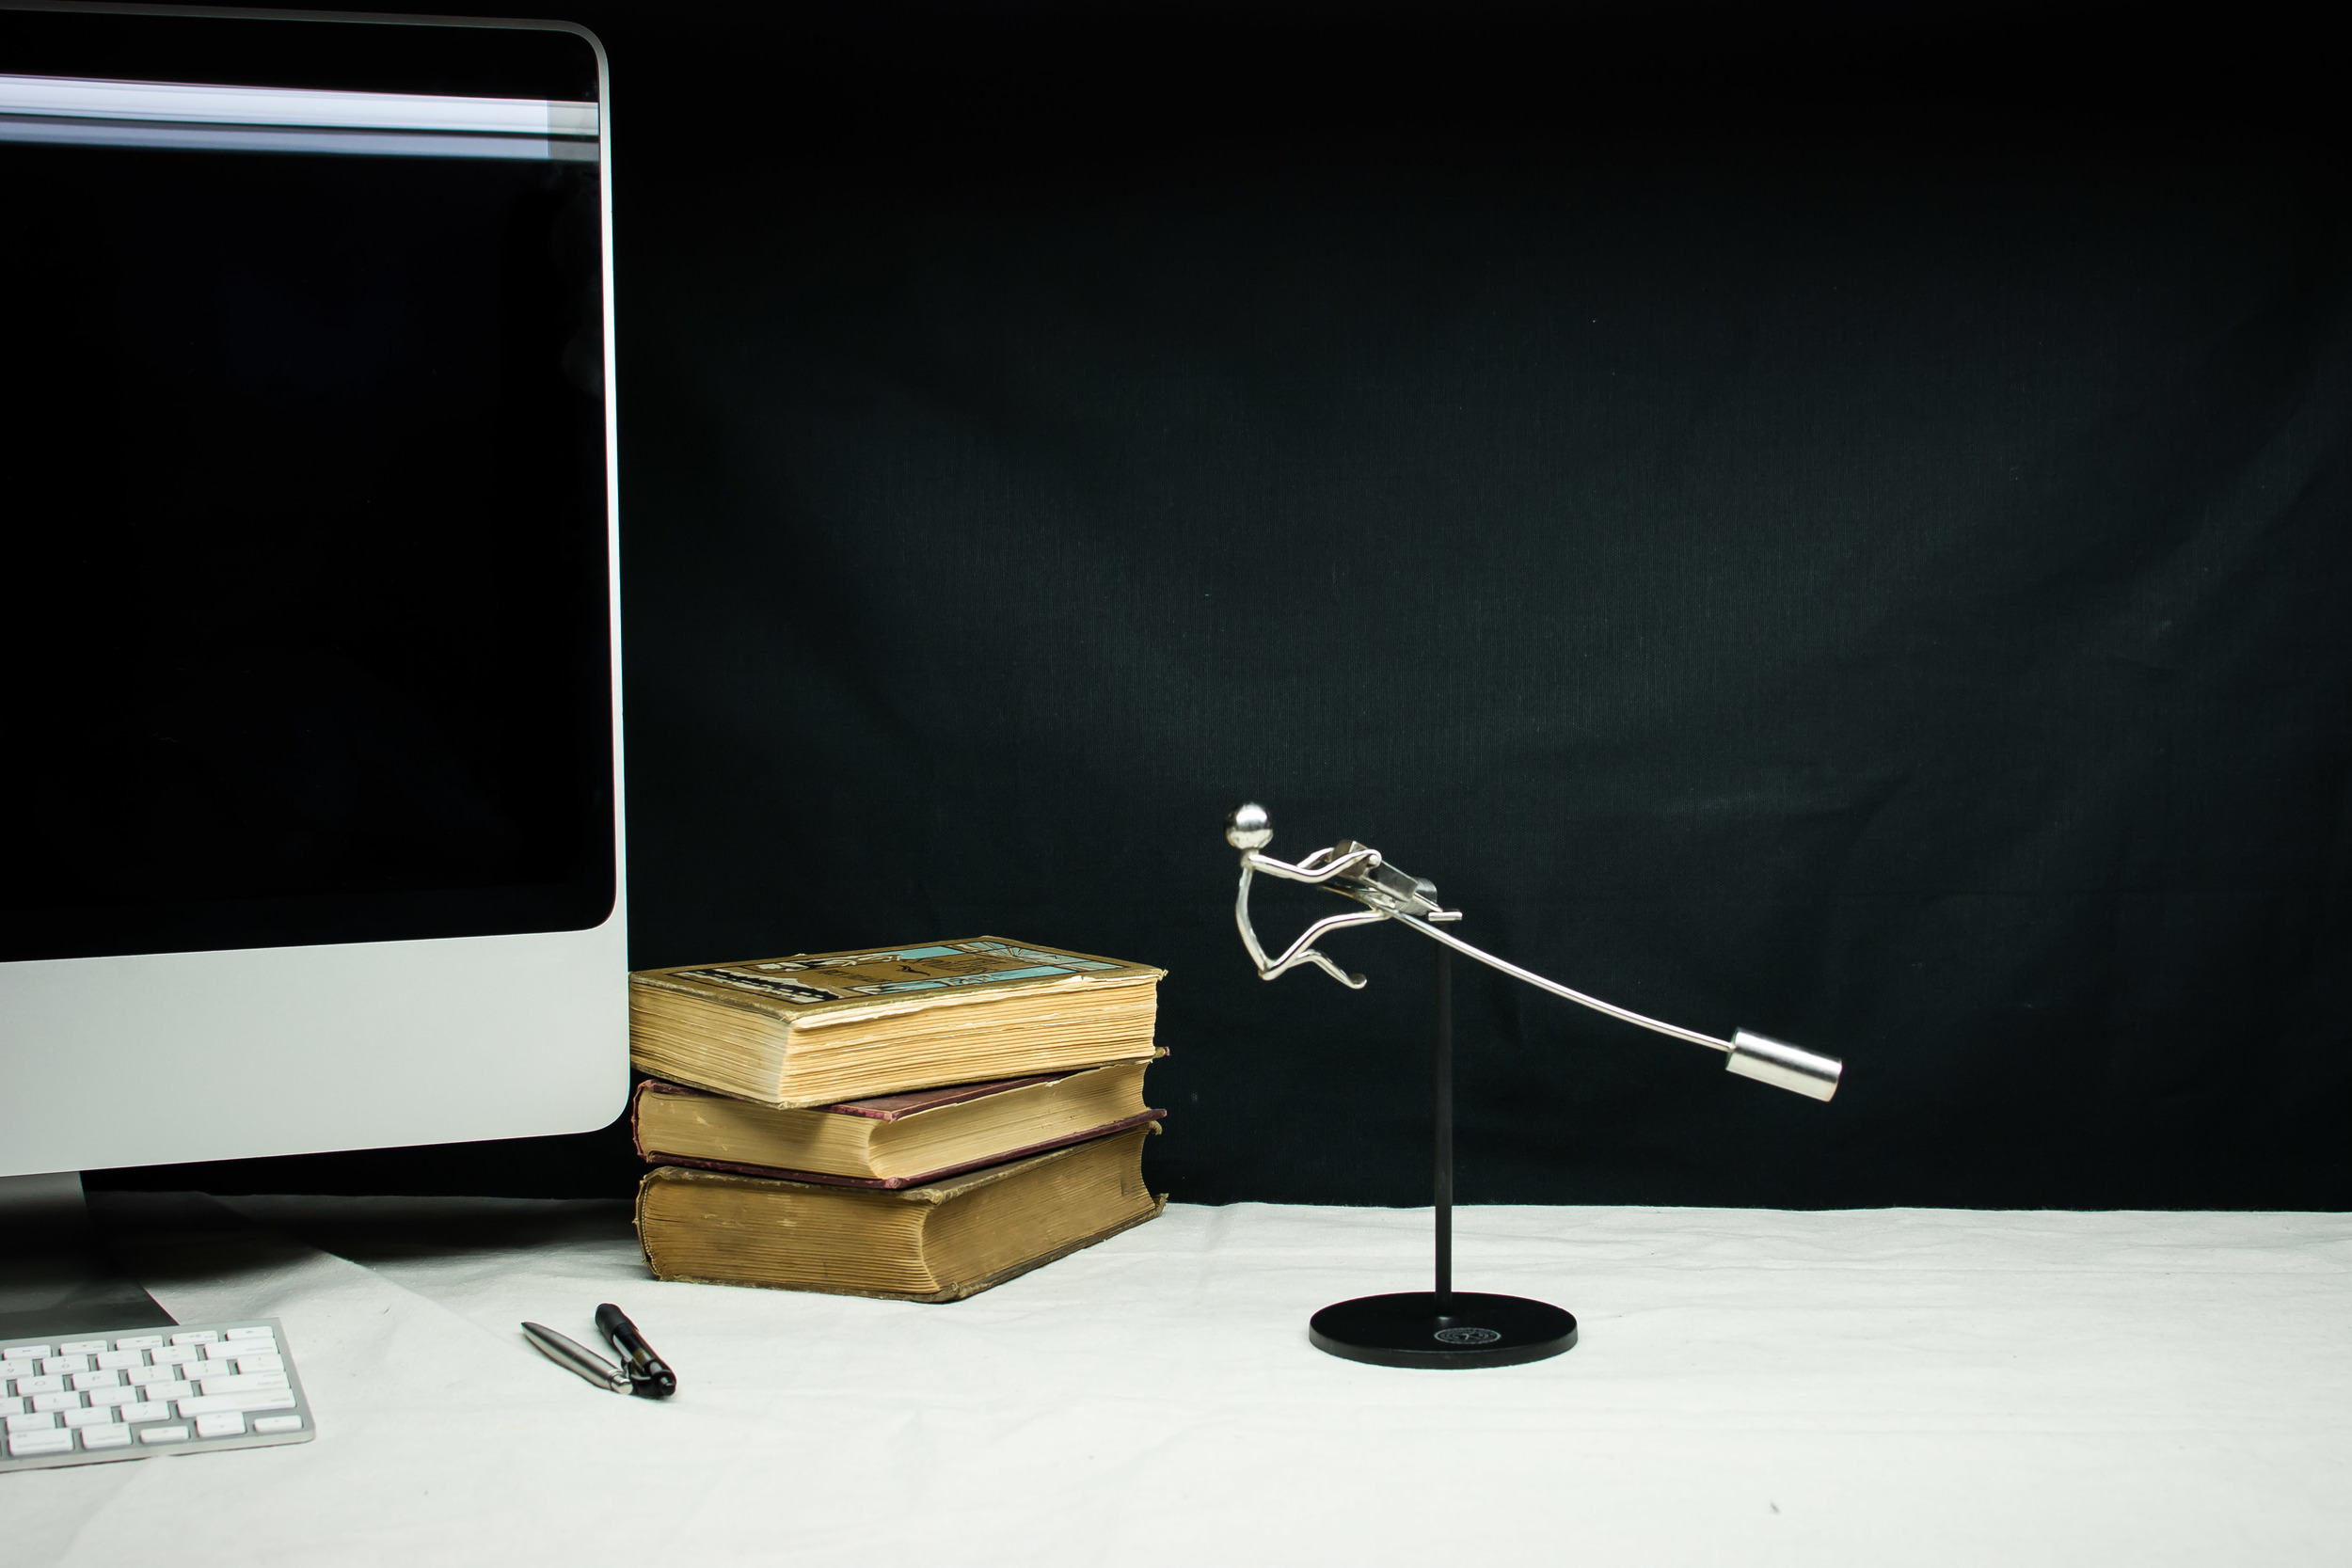 jackhammer man-5.jpg